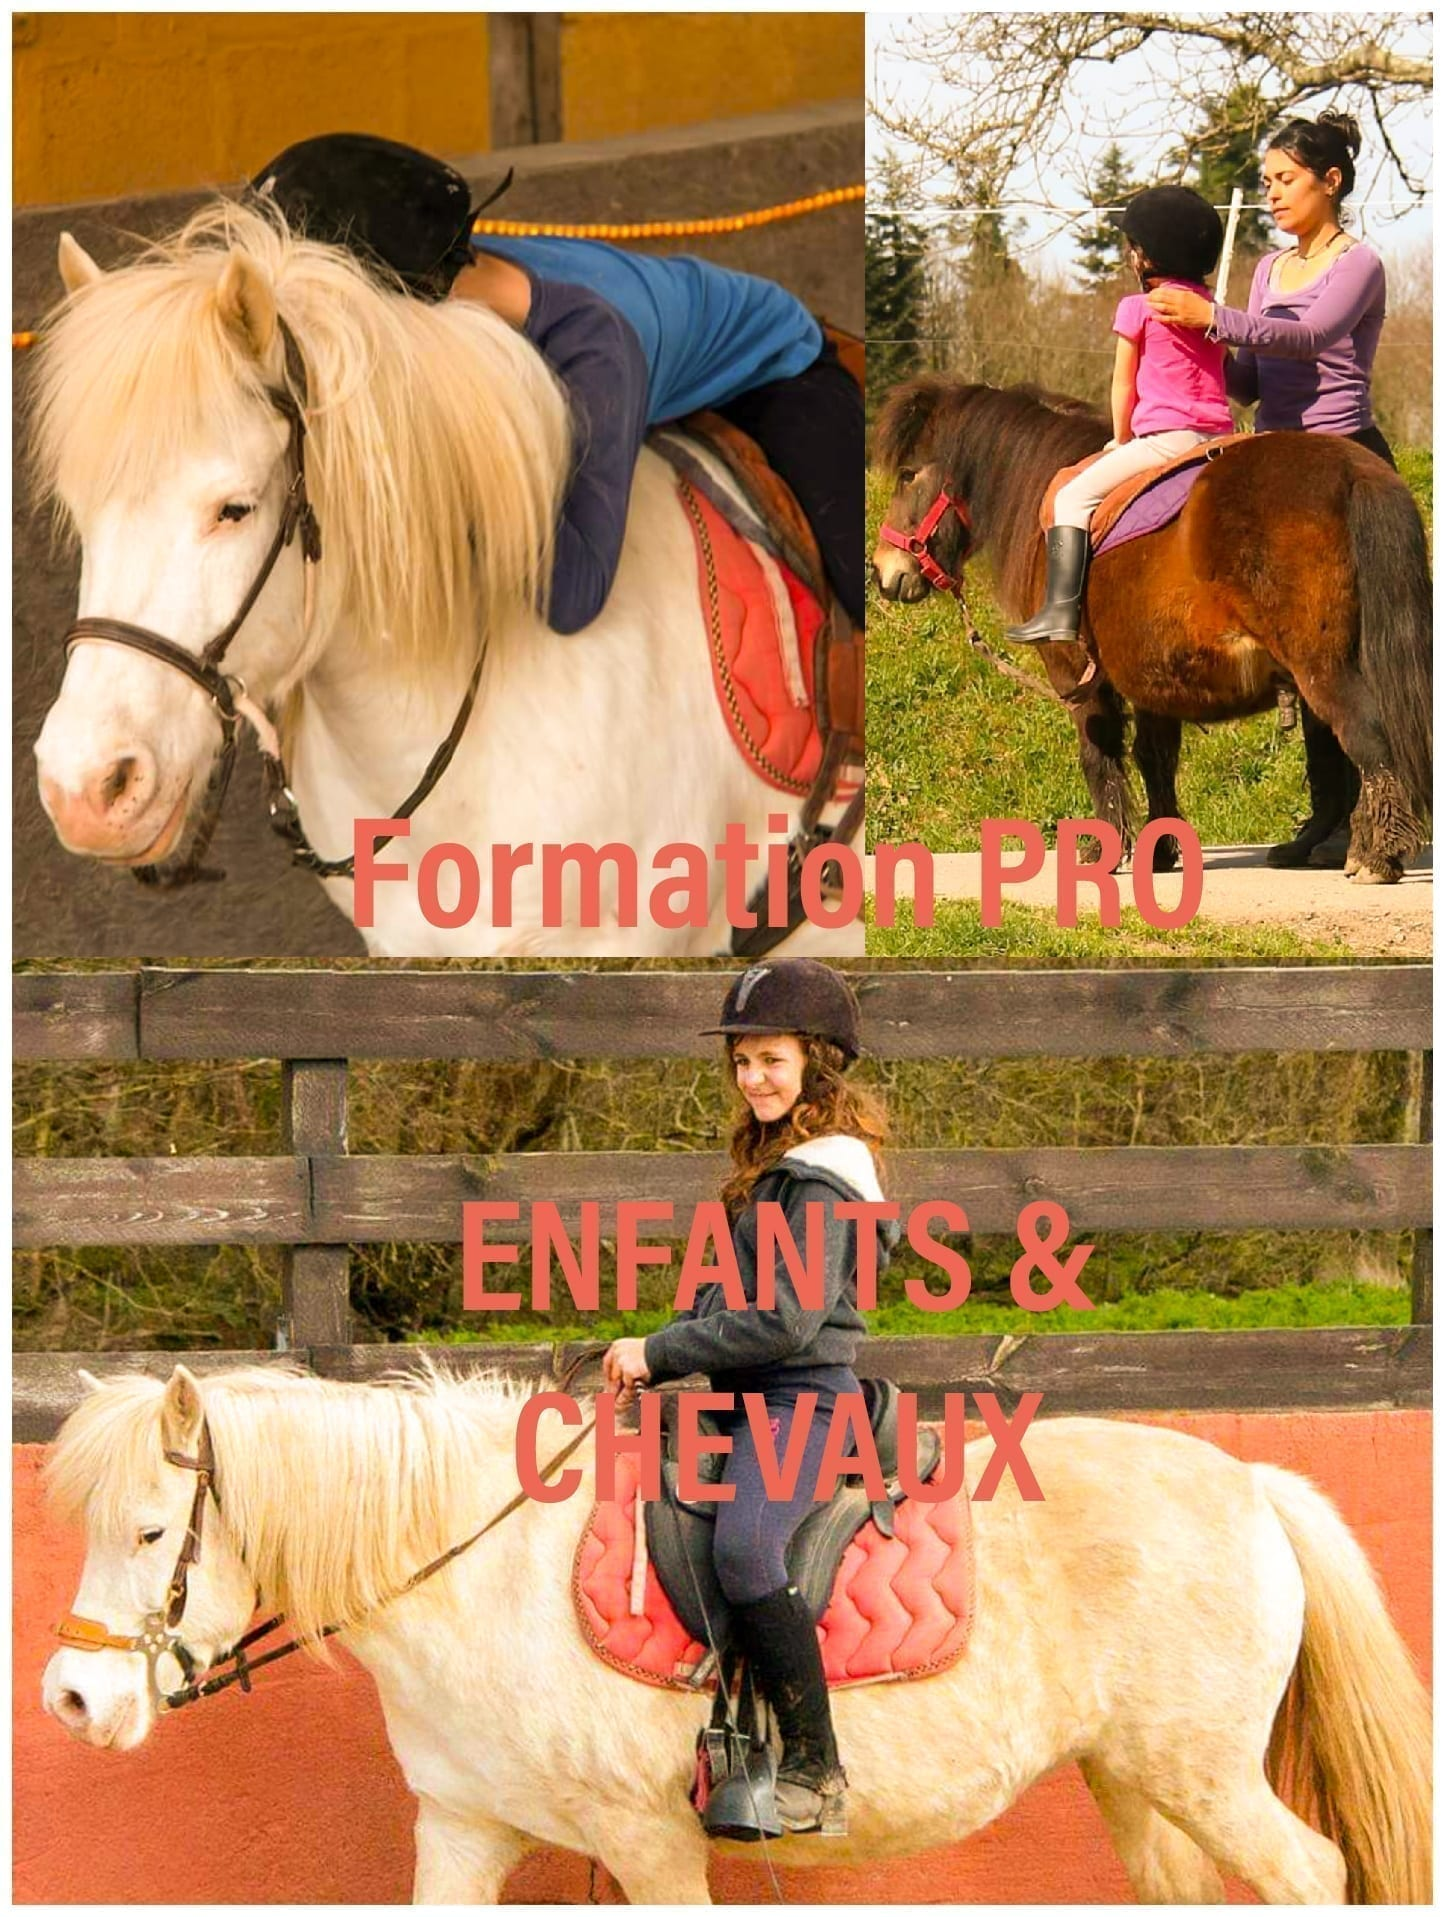 enfants et chevaux.jpg